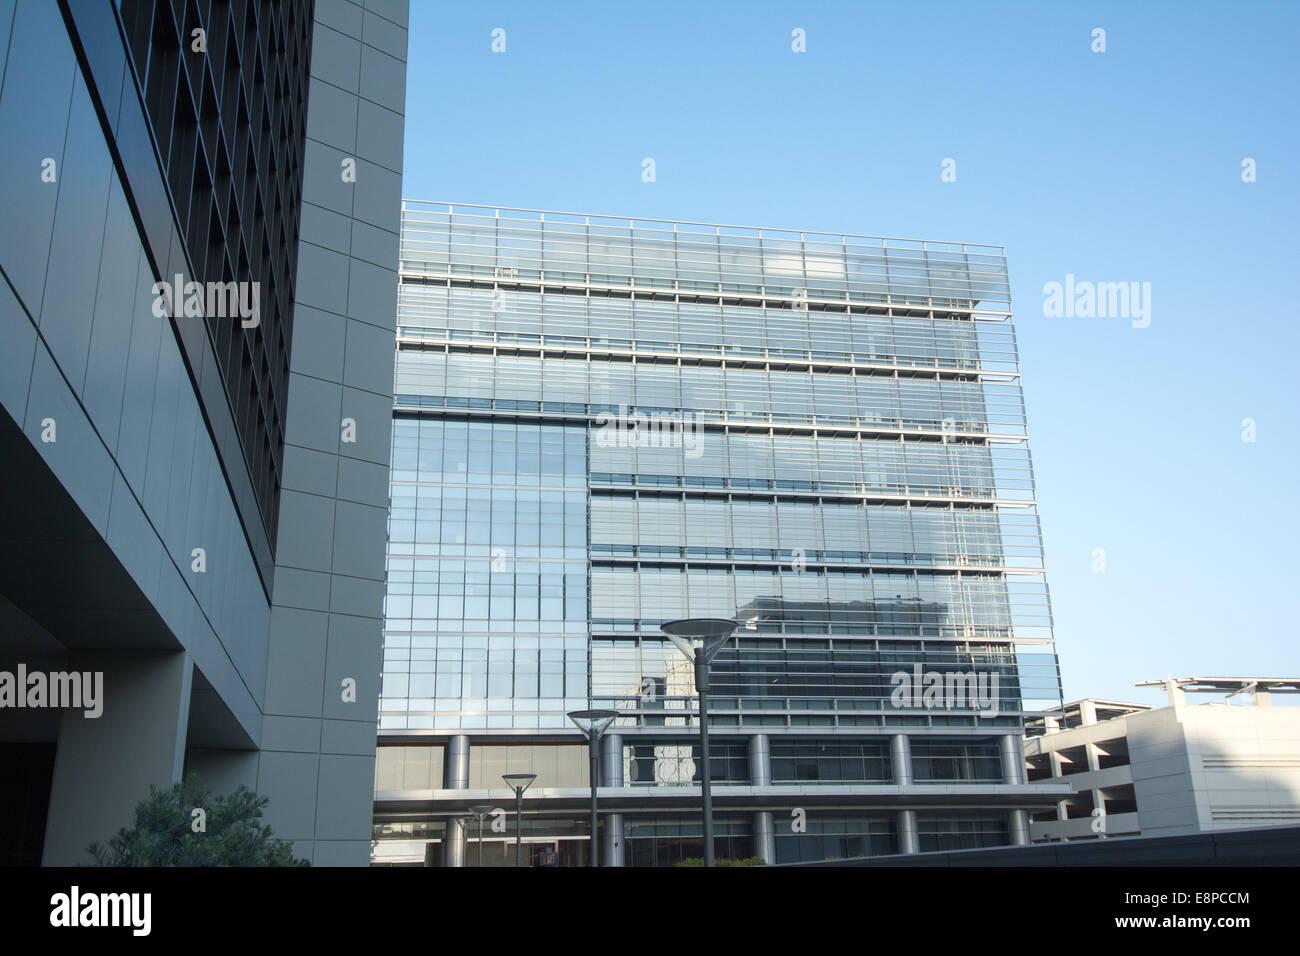 Cedars-Sinai Medical Center, Beverly Hills, California, USA